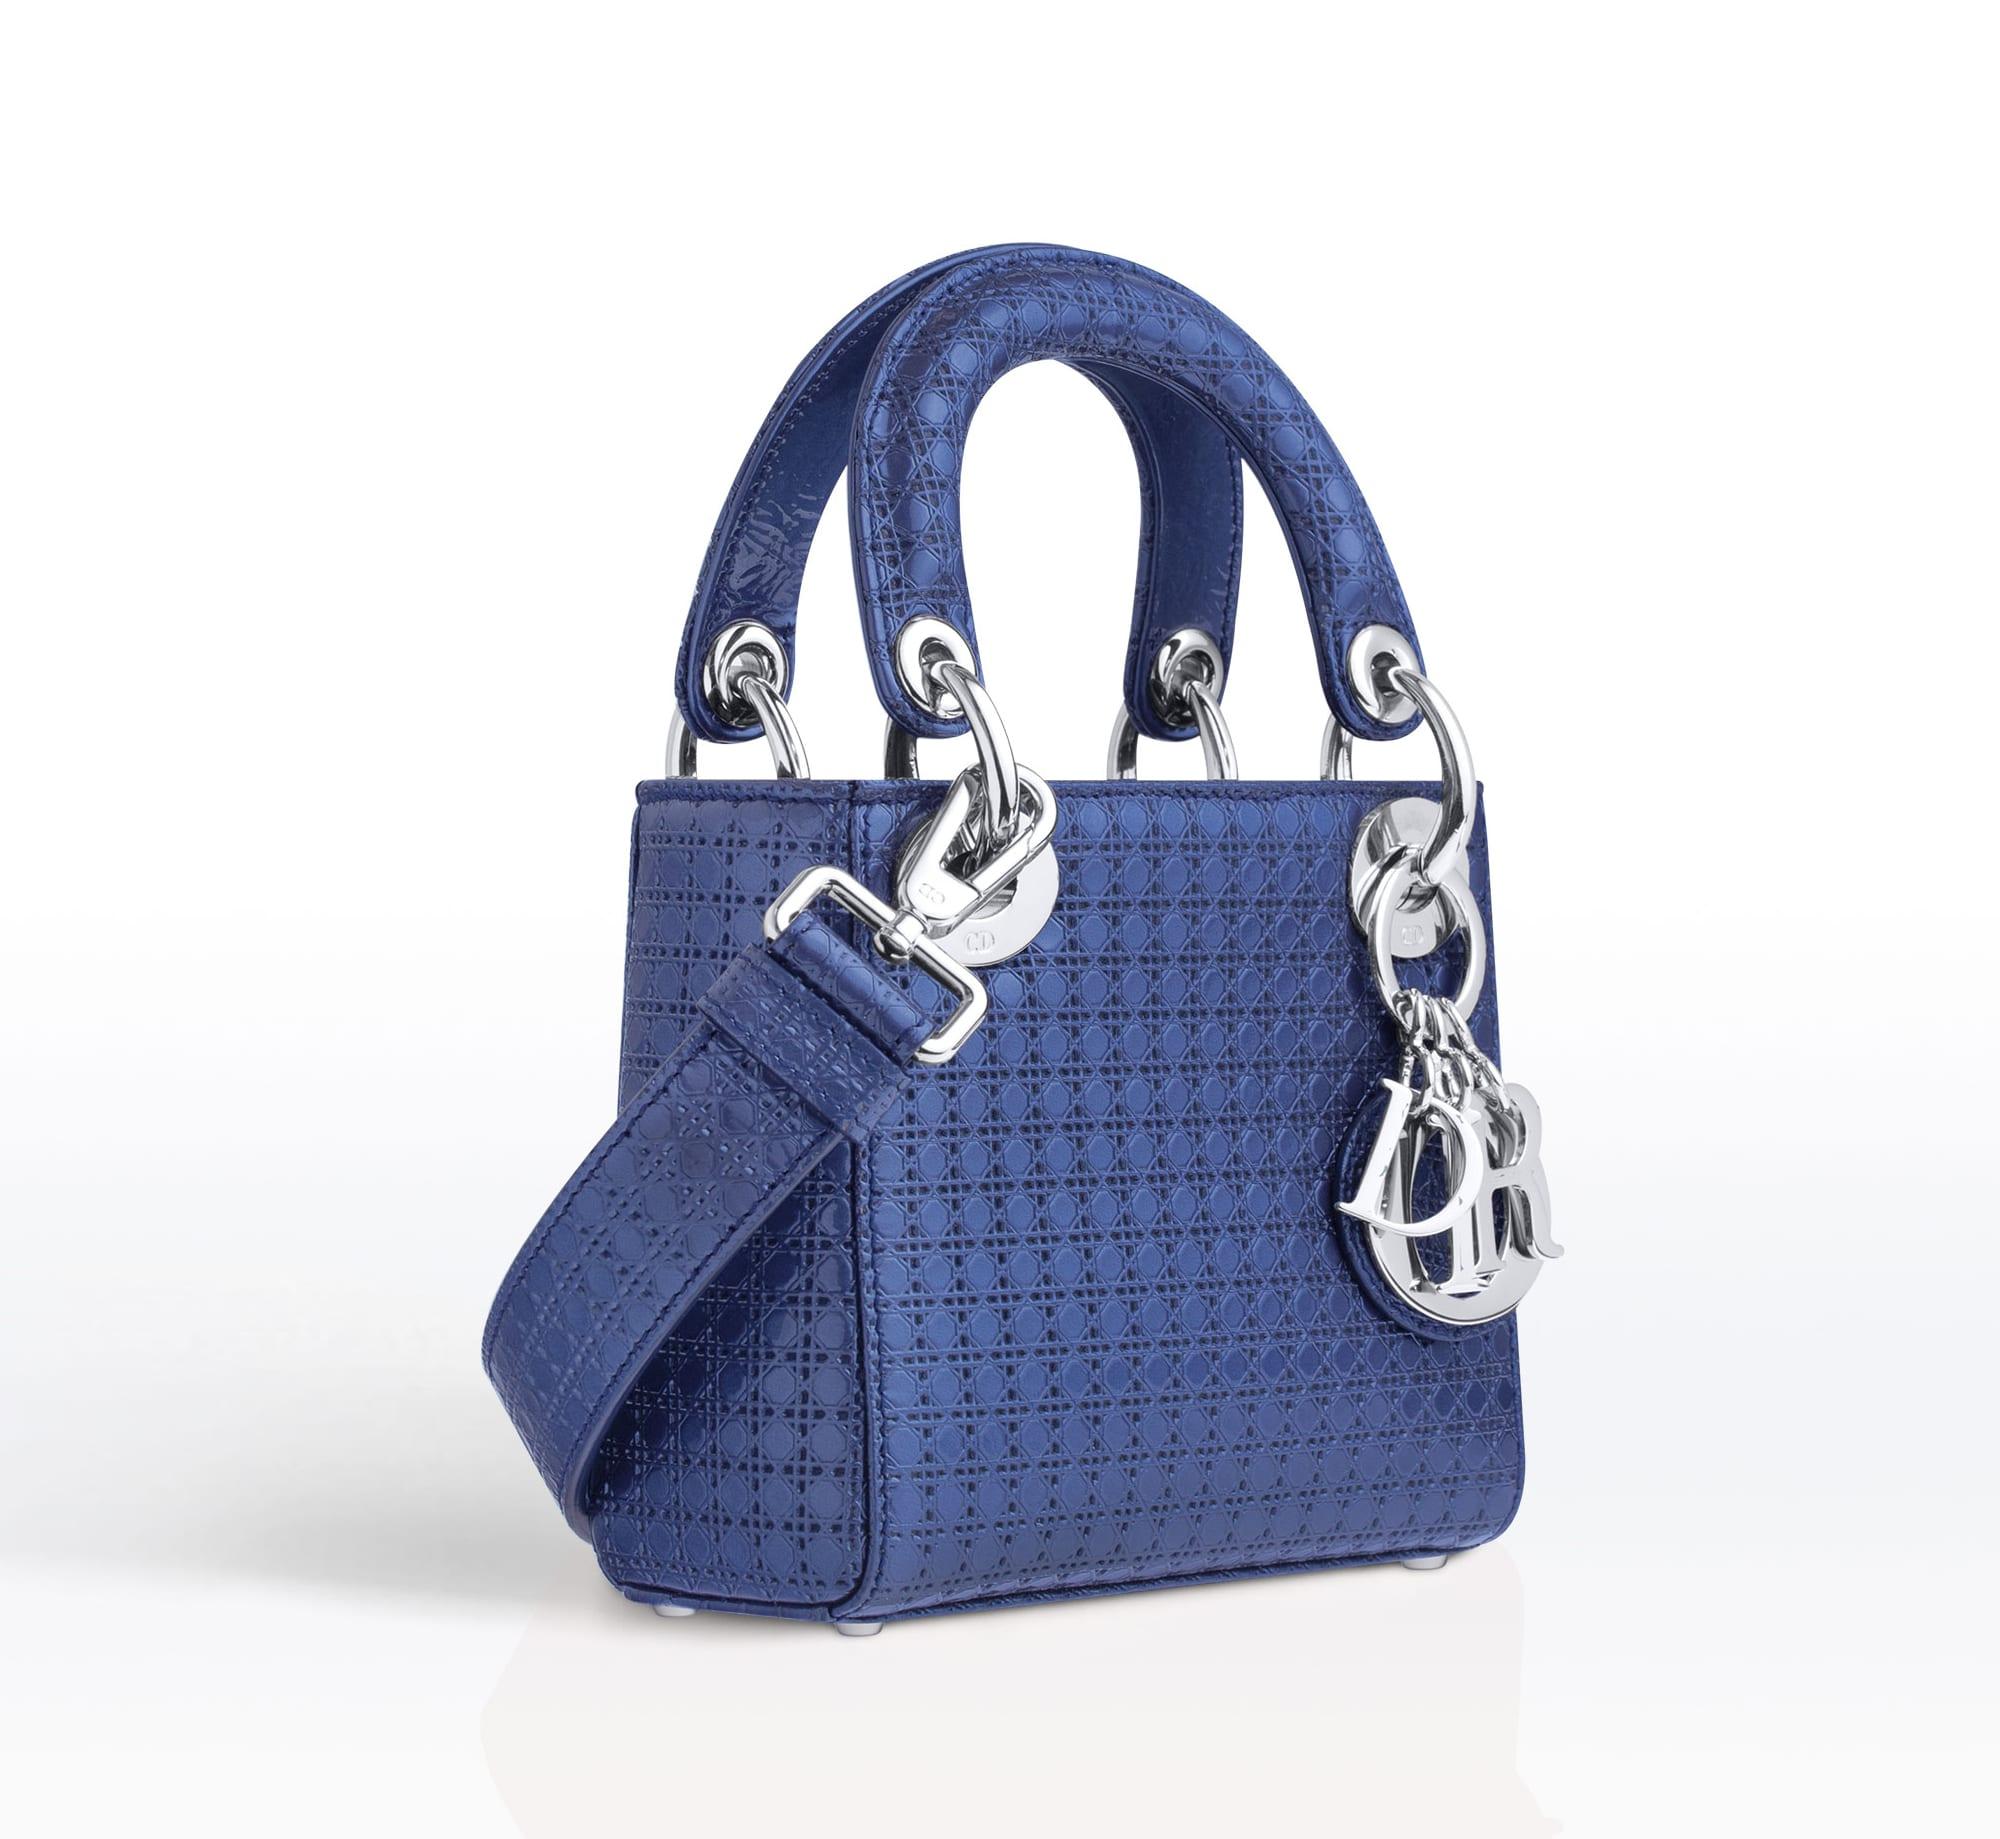 lady dior bag price - photo #2